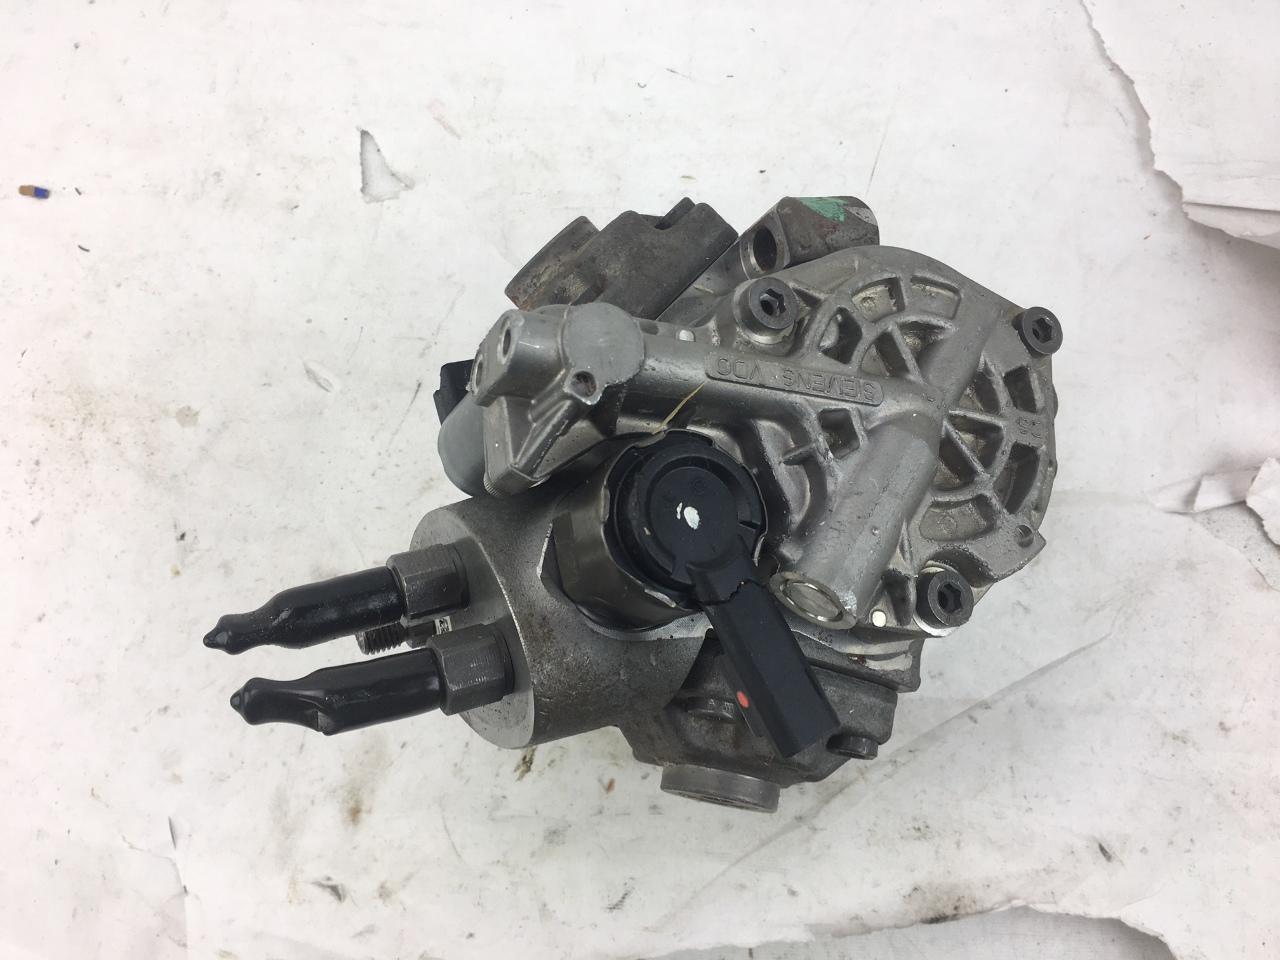 Ford 6 4 Diesel High Pressure Fuel Injection Pump 4307302R91 (S#25-3) |  Lotastock